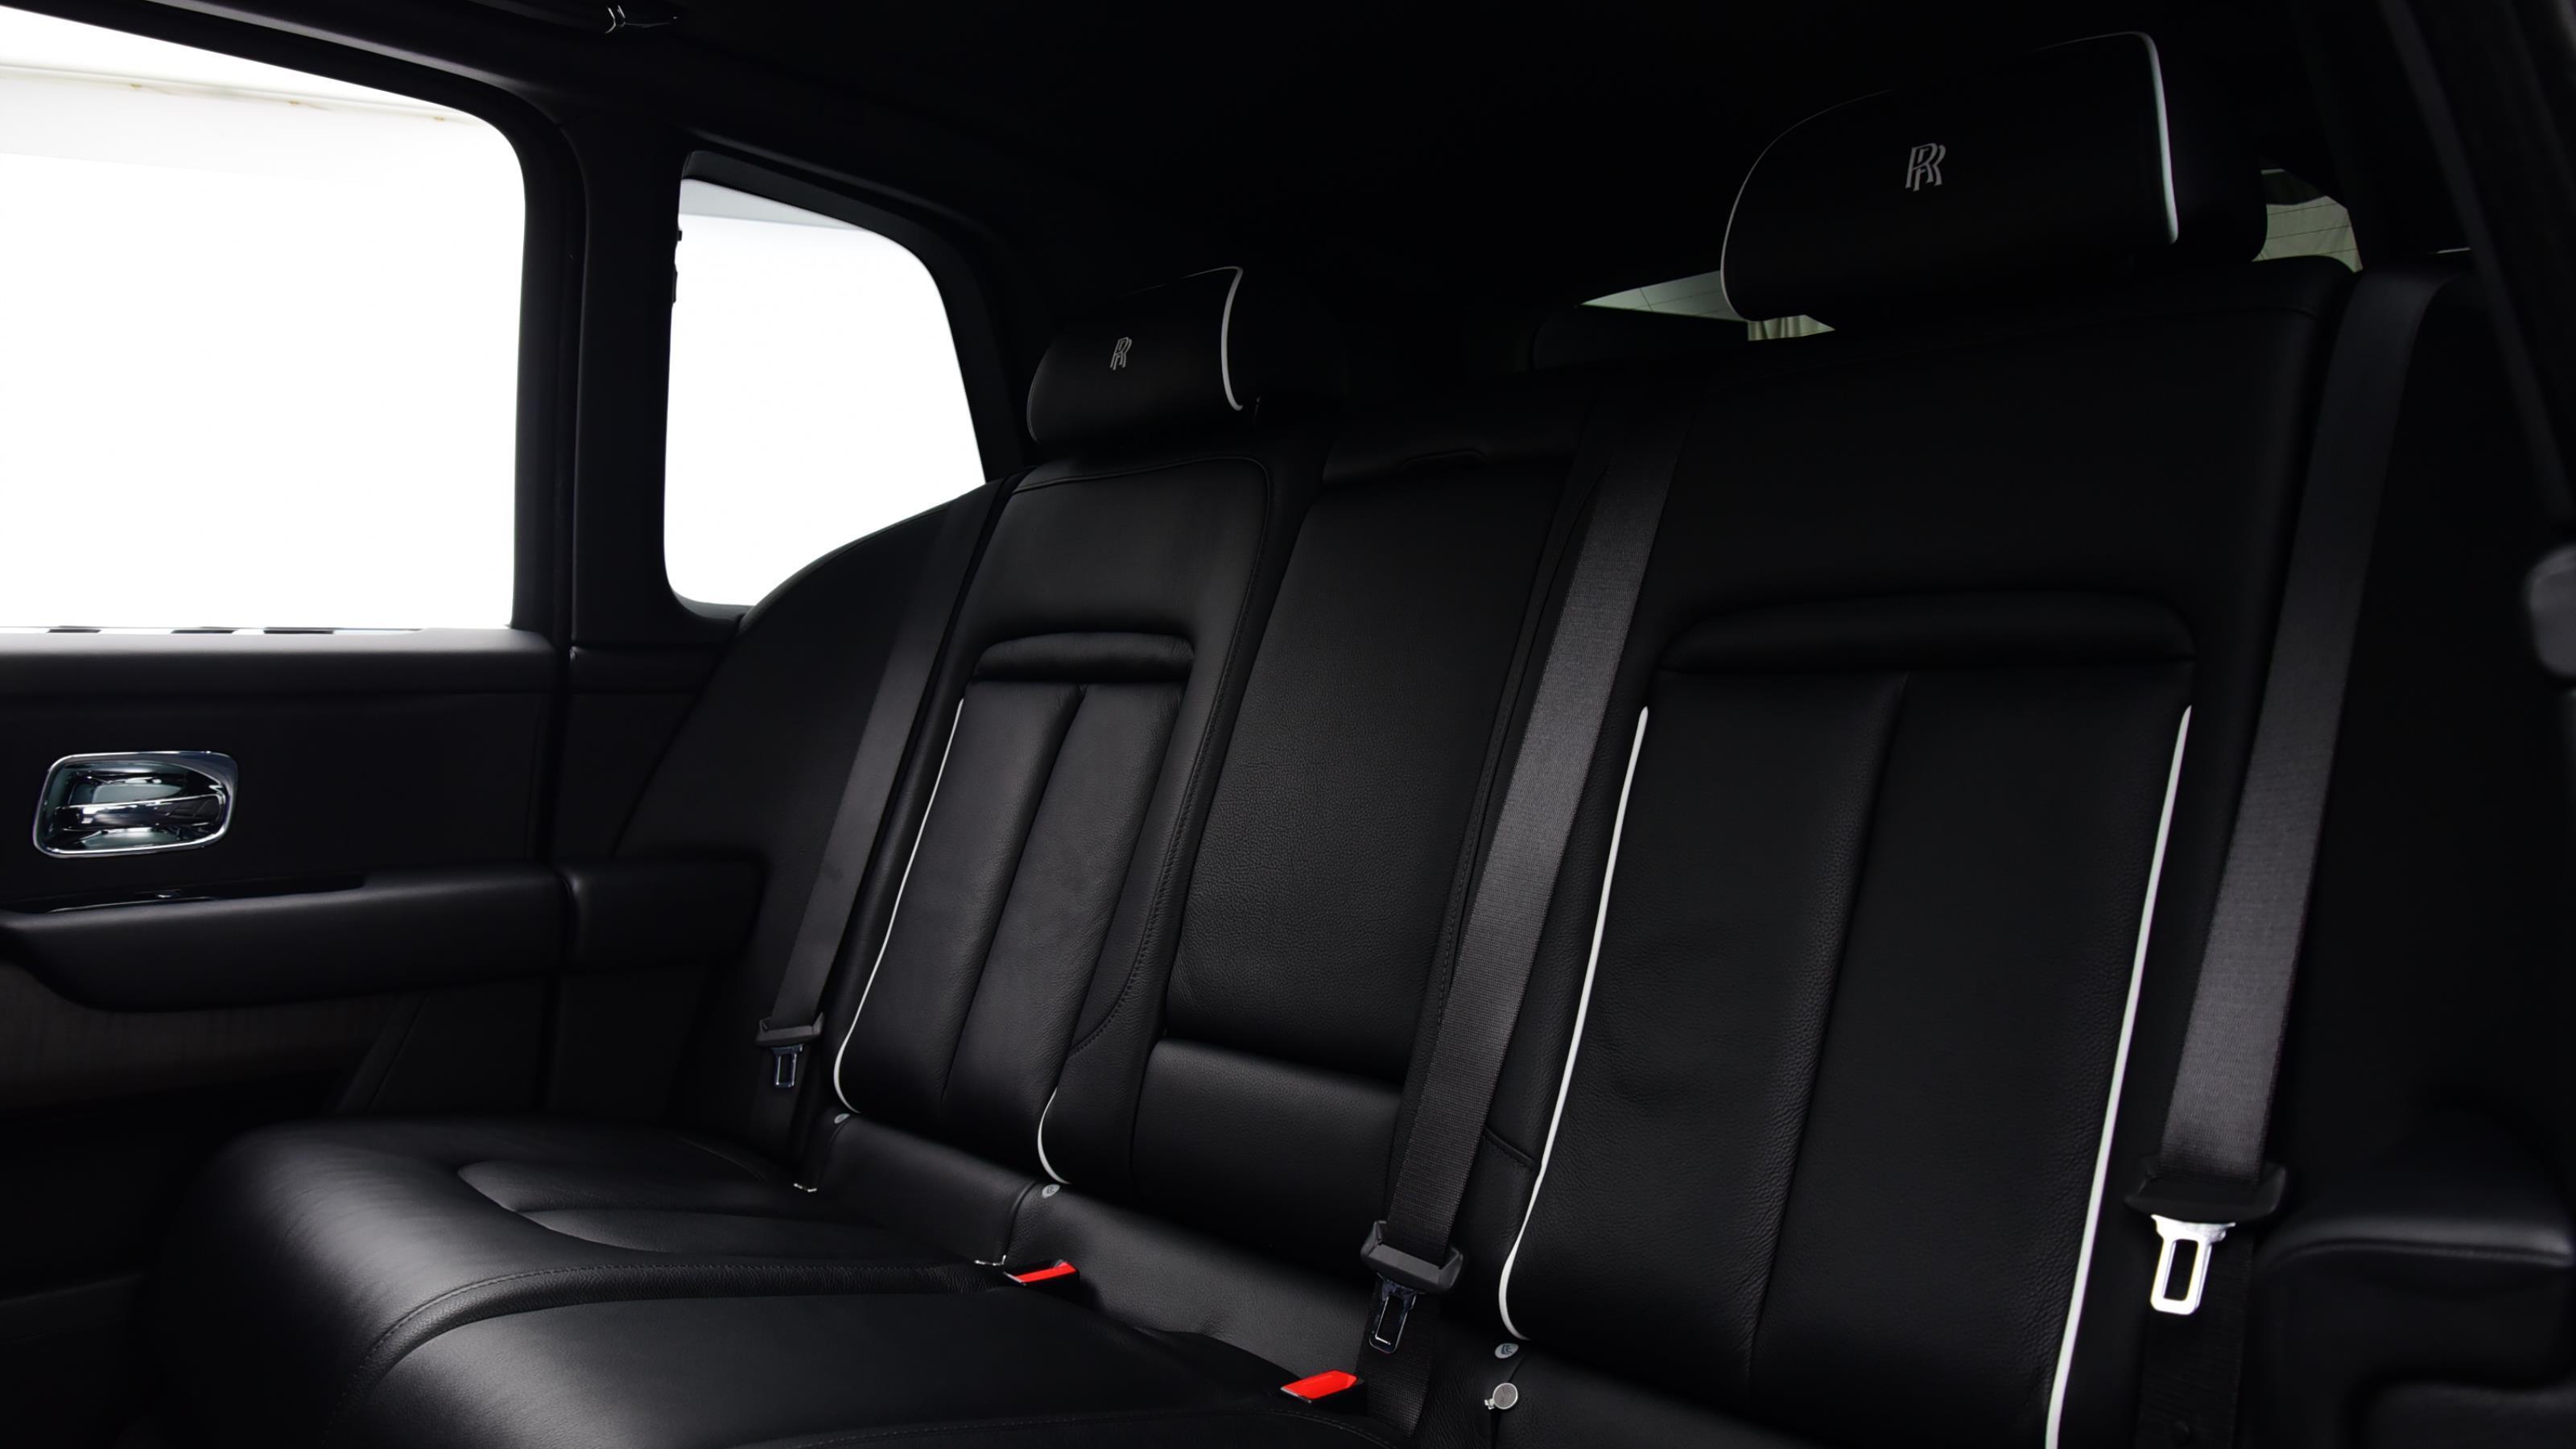 Used 2019 Rolls-Royce Cullinan V12 Auto BLACK at Saxton4x4